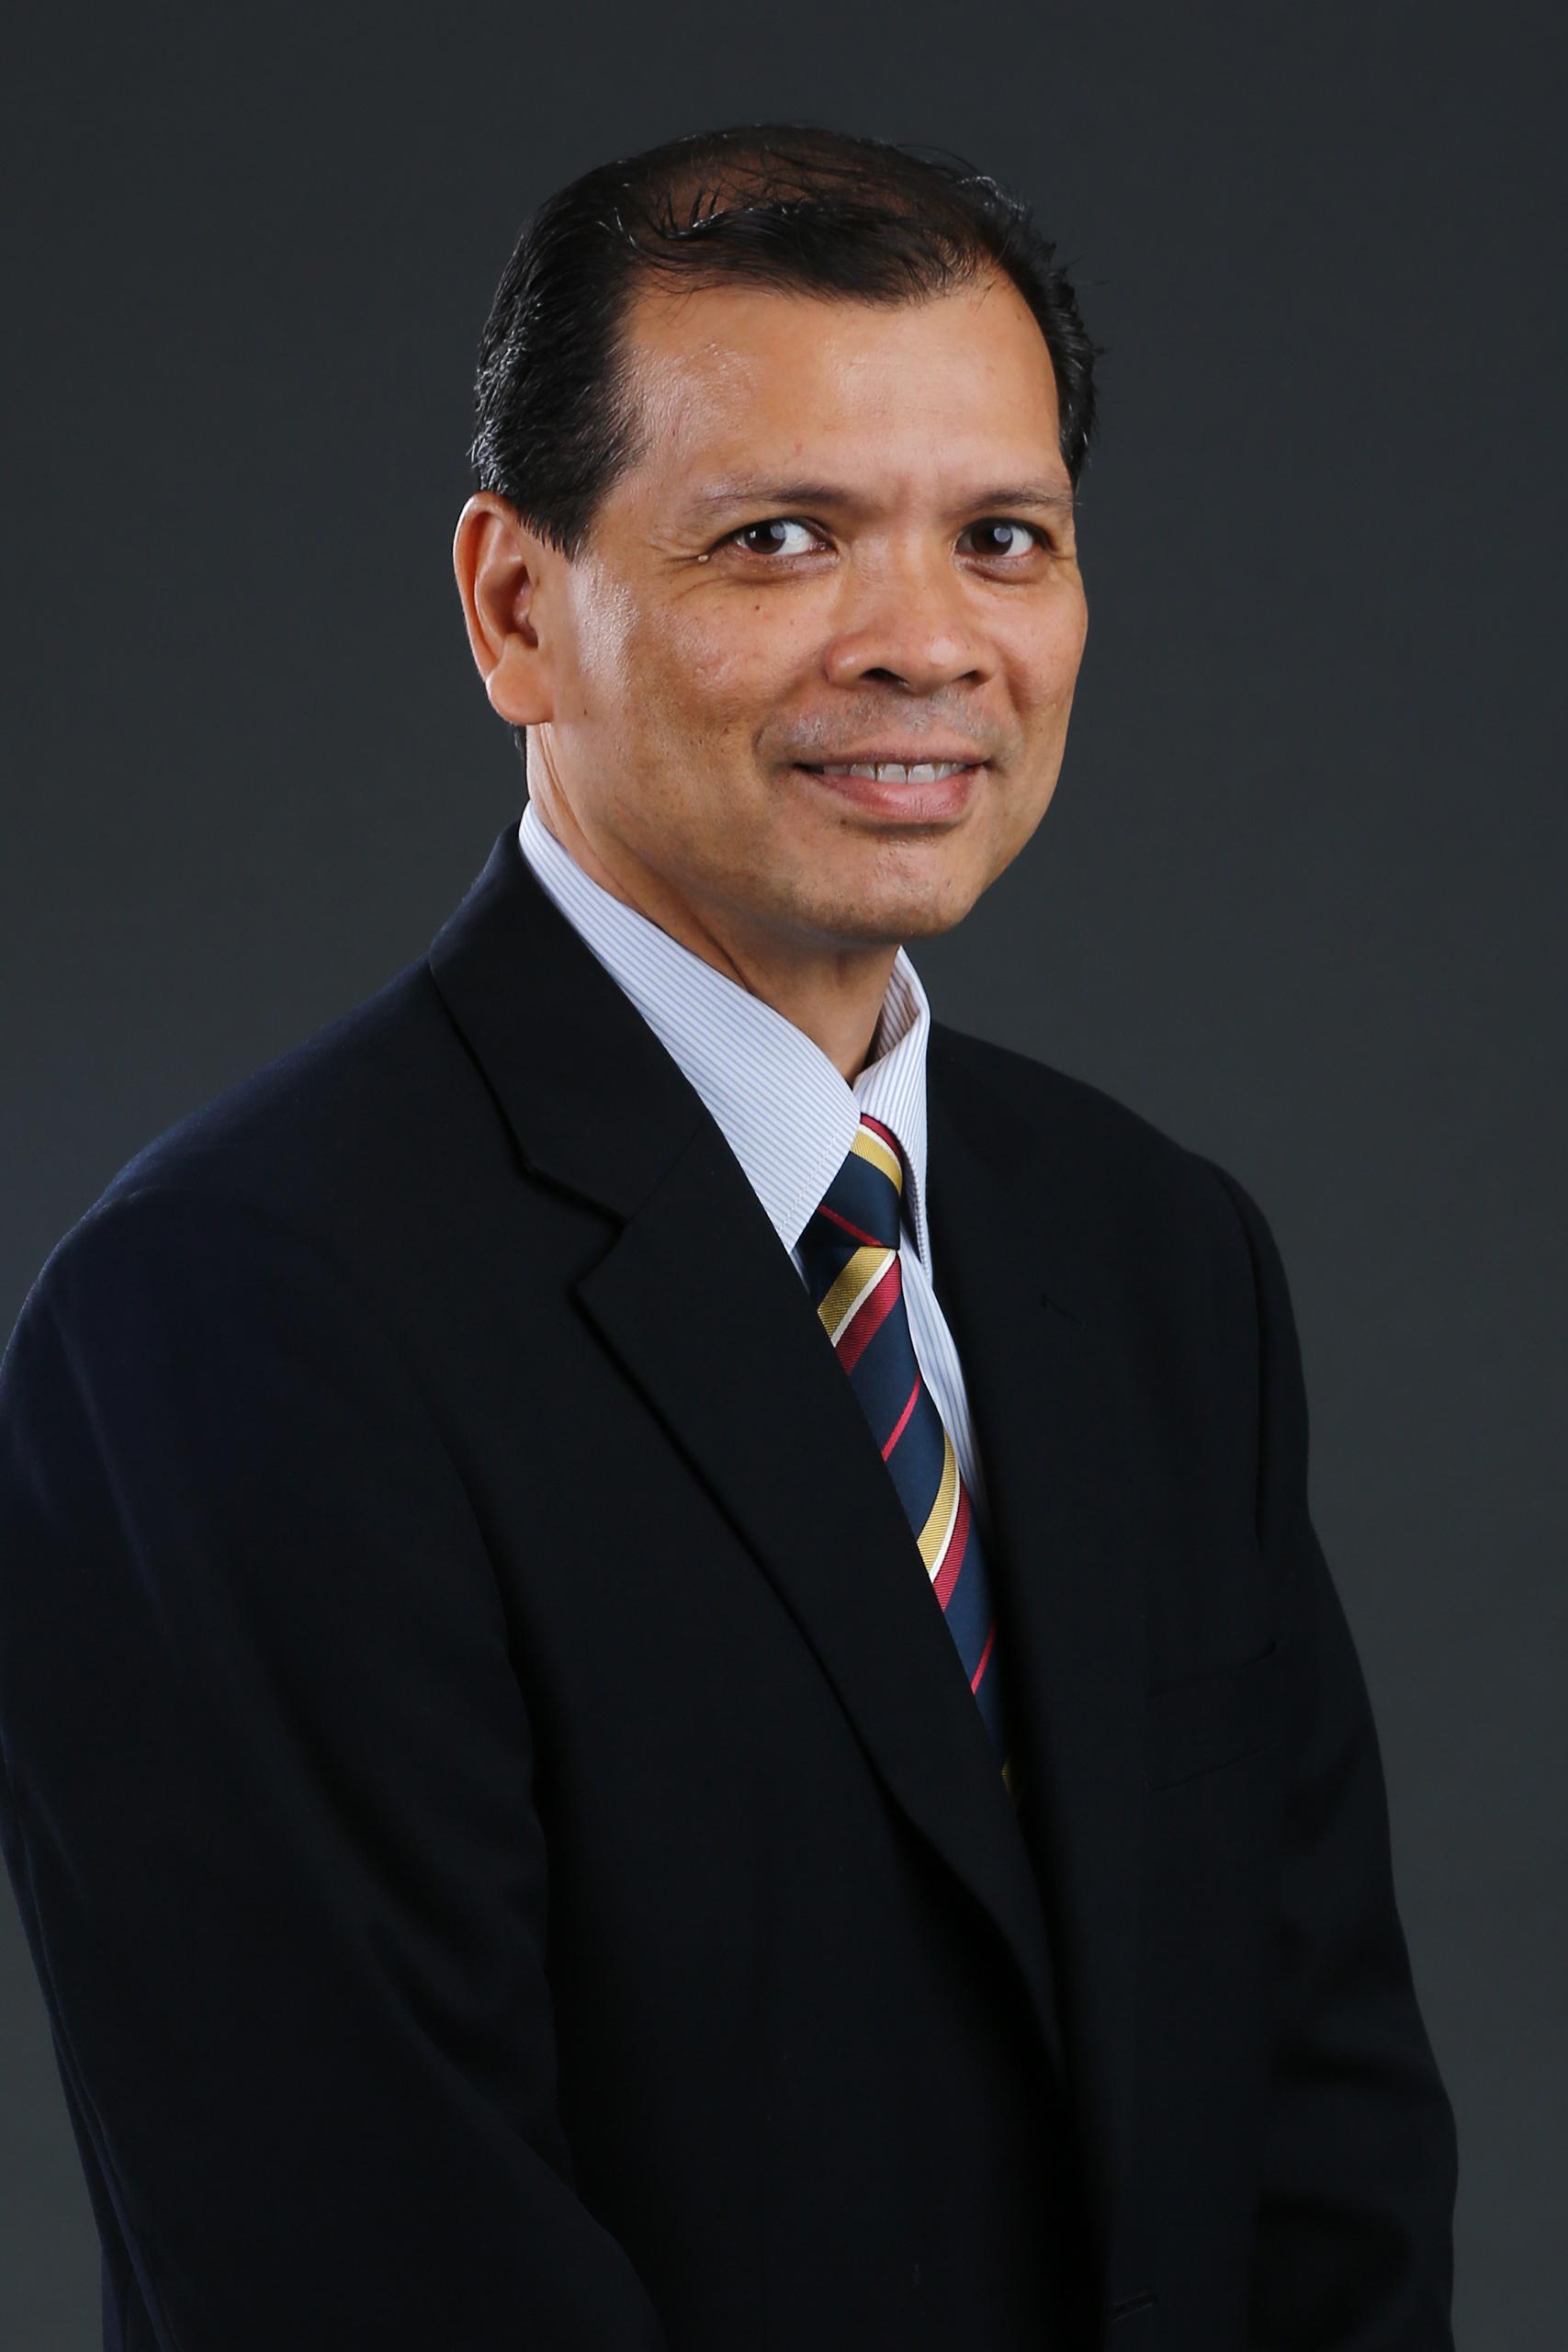 Prof. Dr. Rosli bin Md. Illias